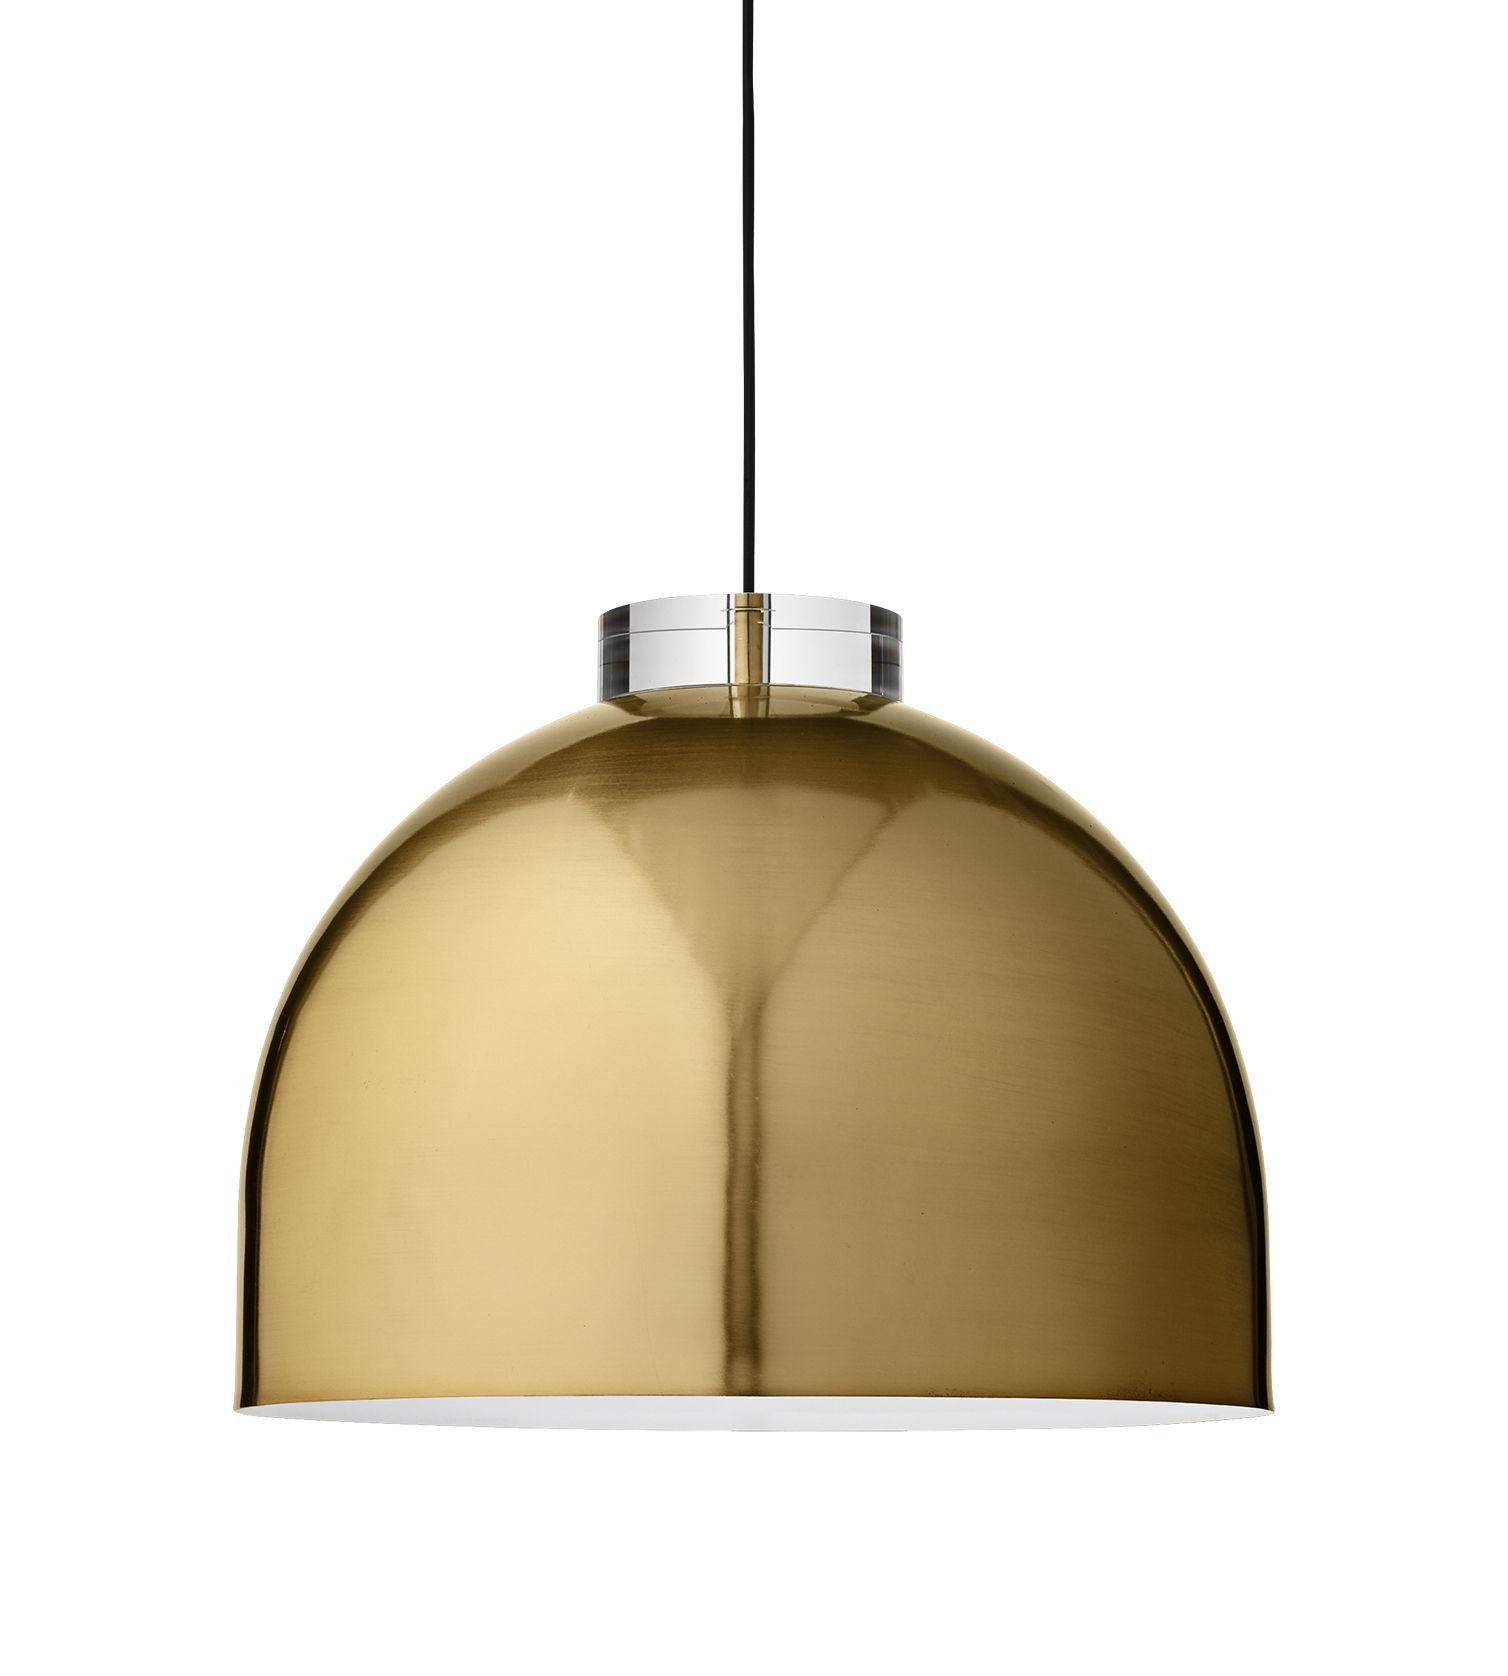 Luminaire - Suspensions - Suspension Luceo Ronde / Large Ø 45 cm - Métal & verre - AYTM - Or - Fer plaqué laiton, Verre